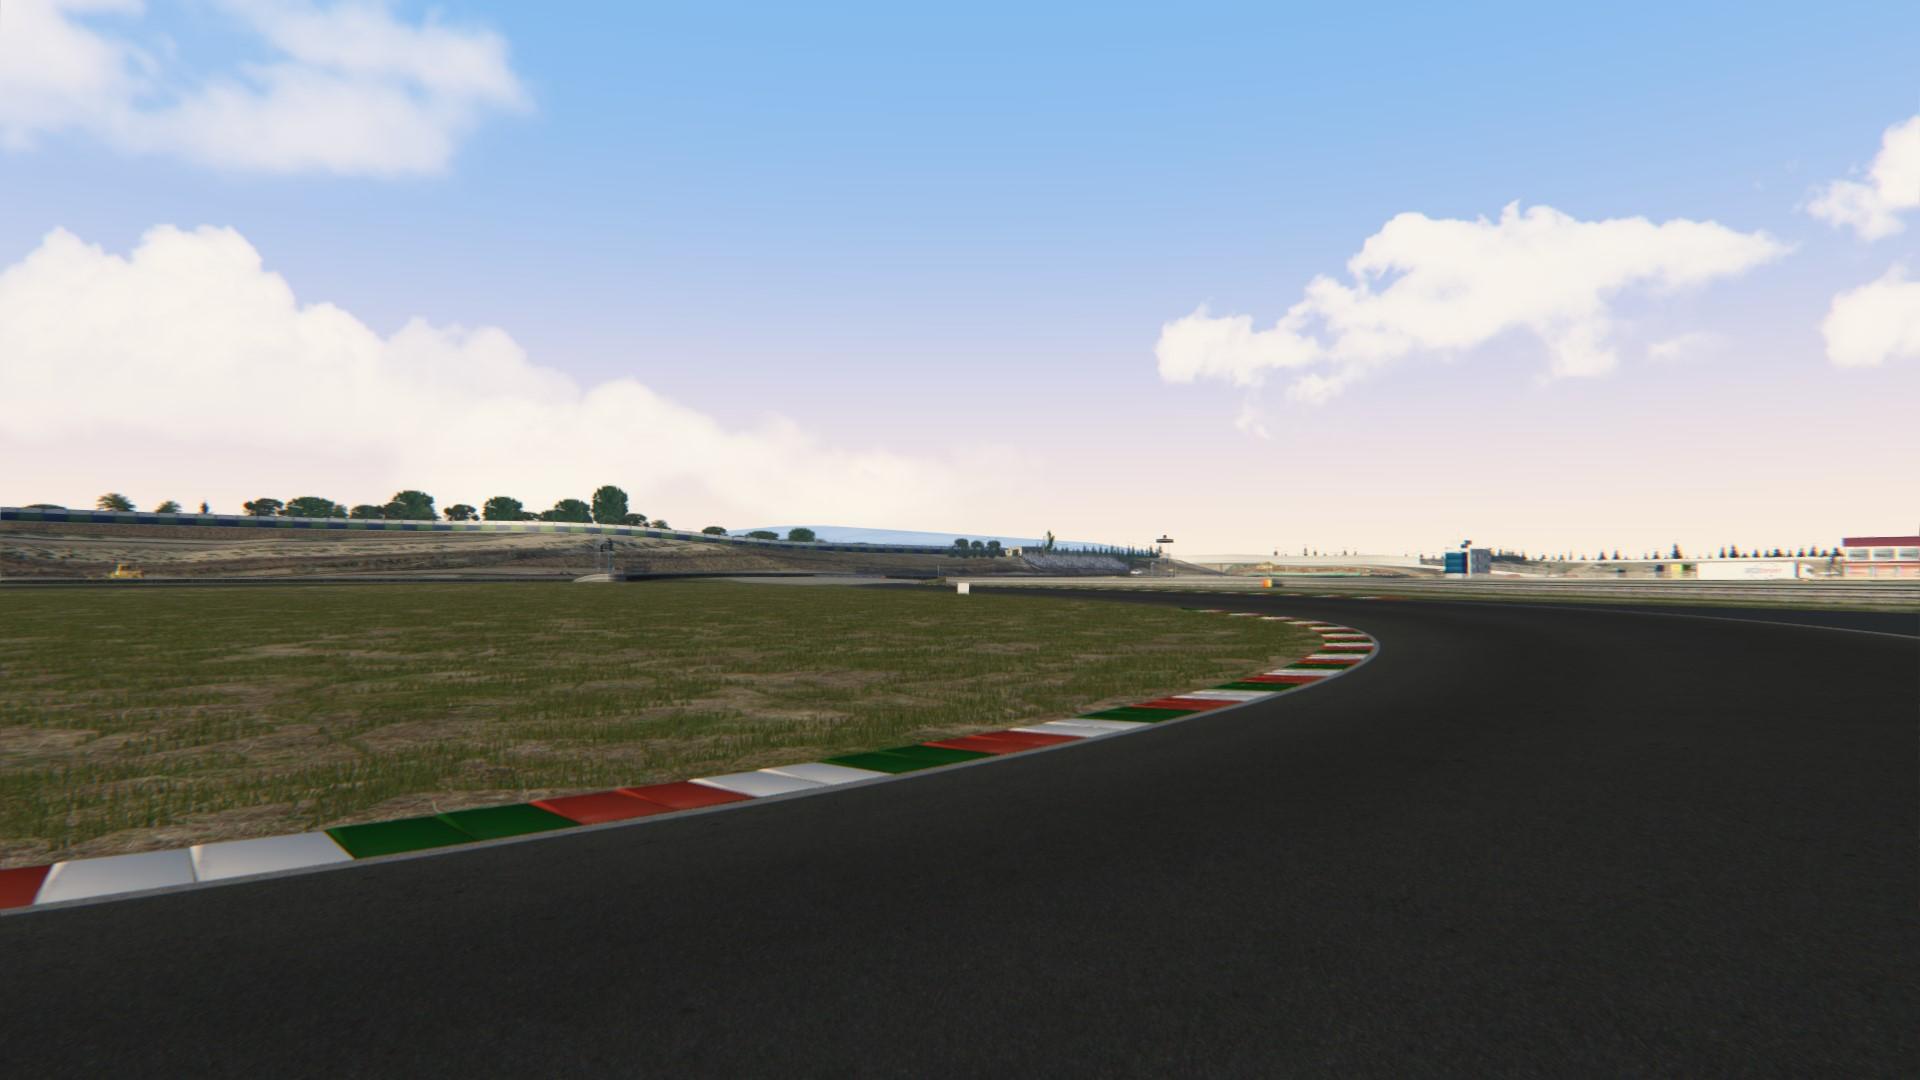 Screenshot_ks_toyota_ae86_autodromo_di_franciacorta_1-6-116-0-35-10.jpg